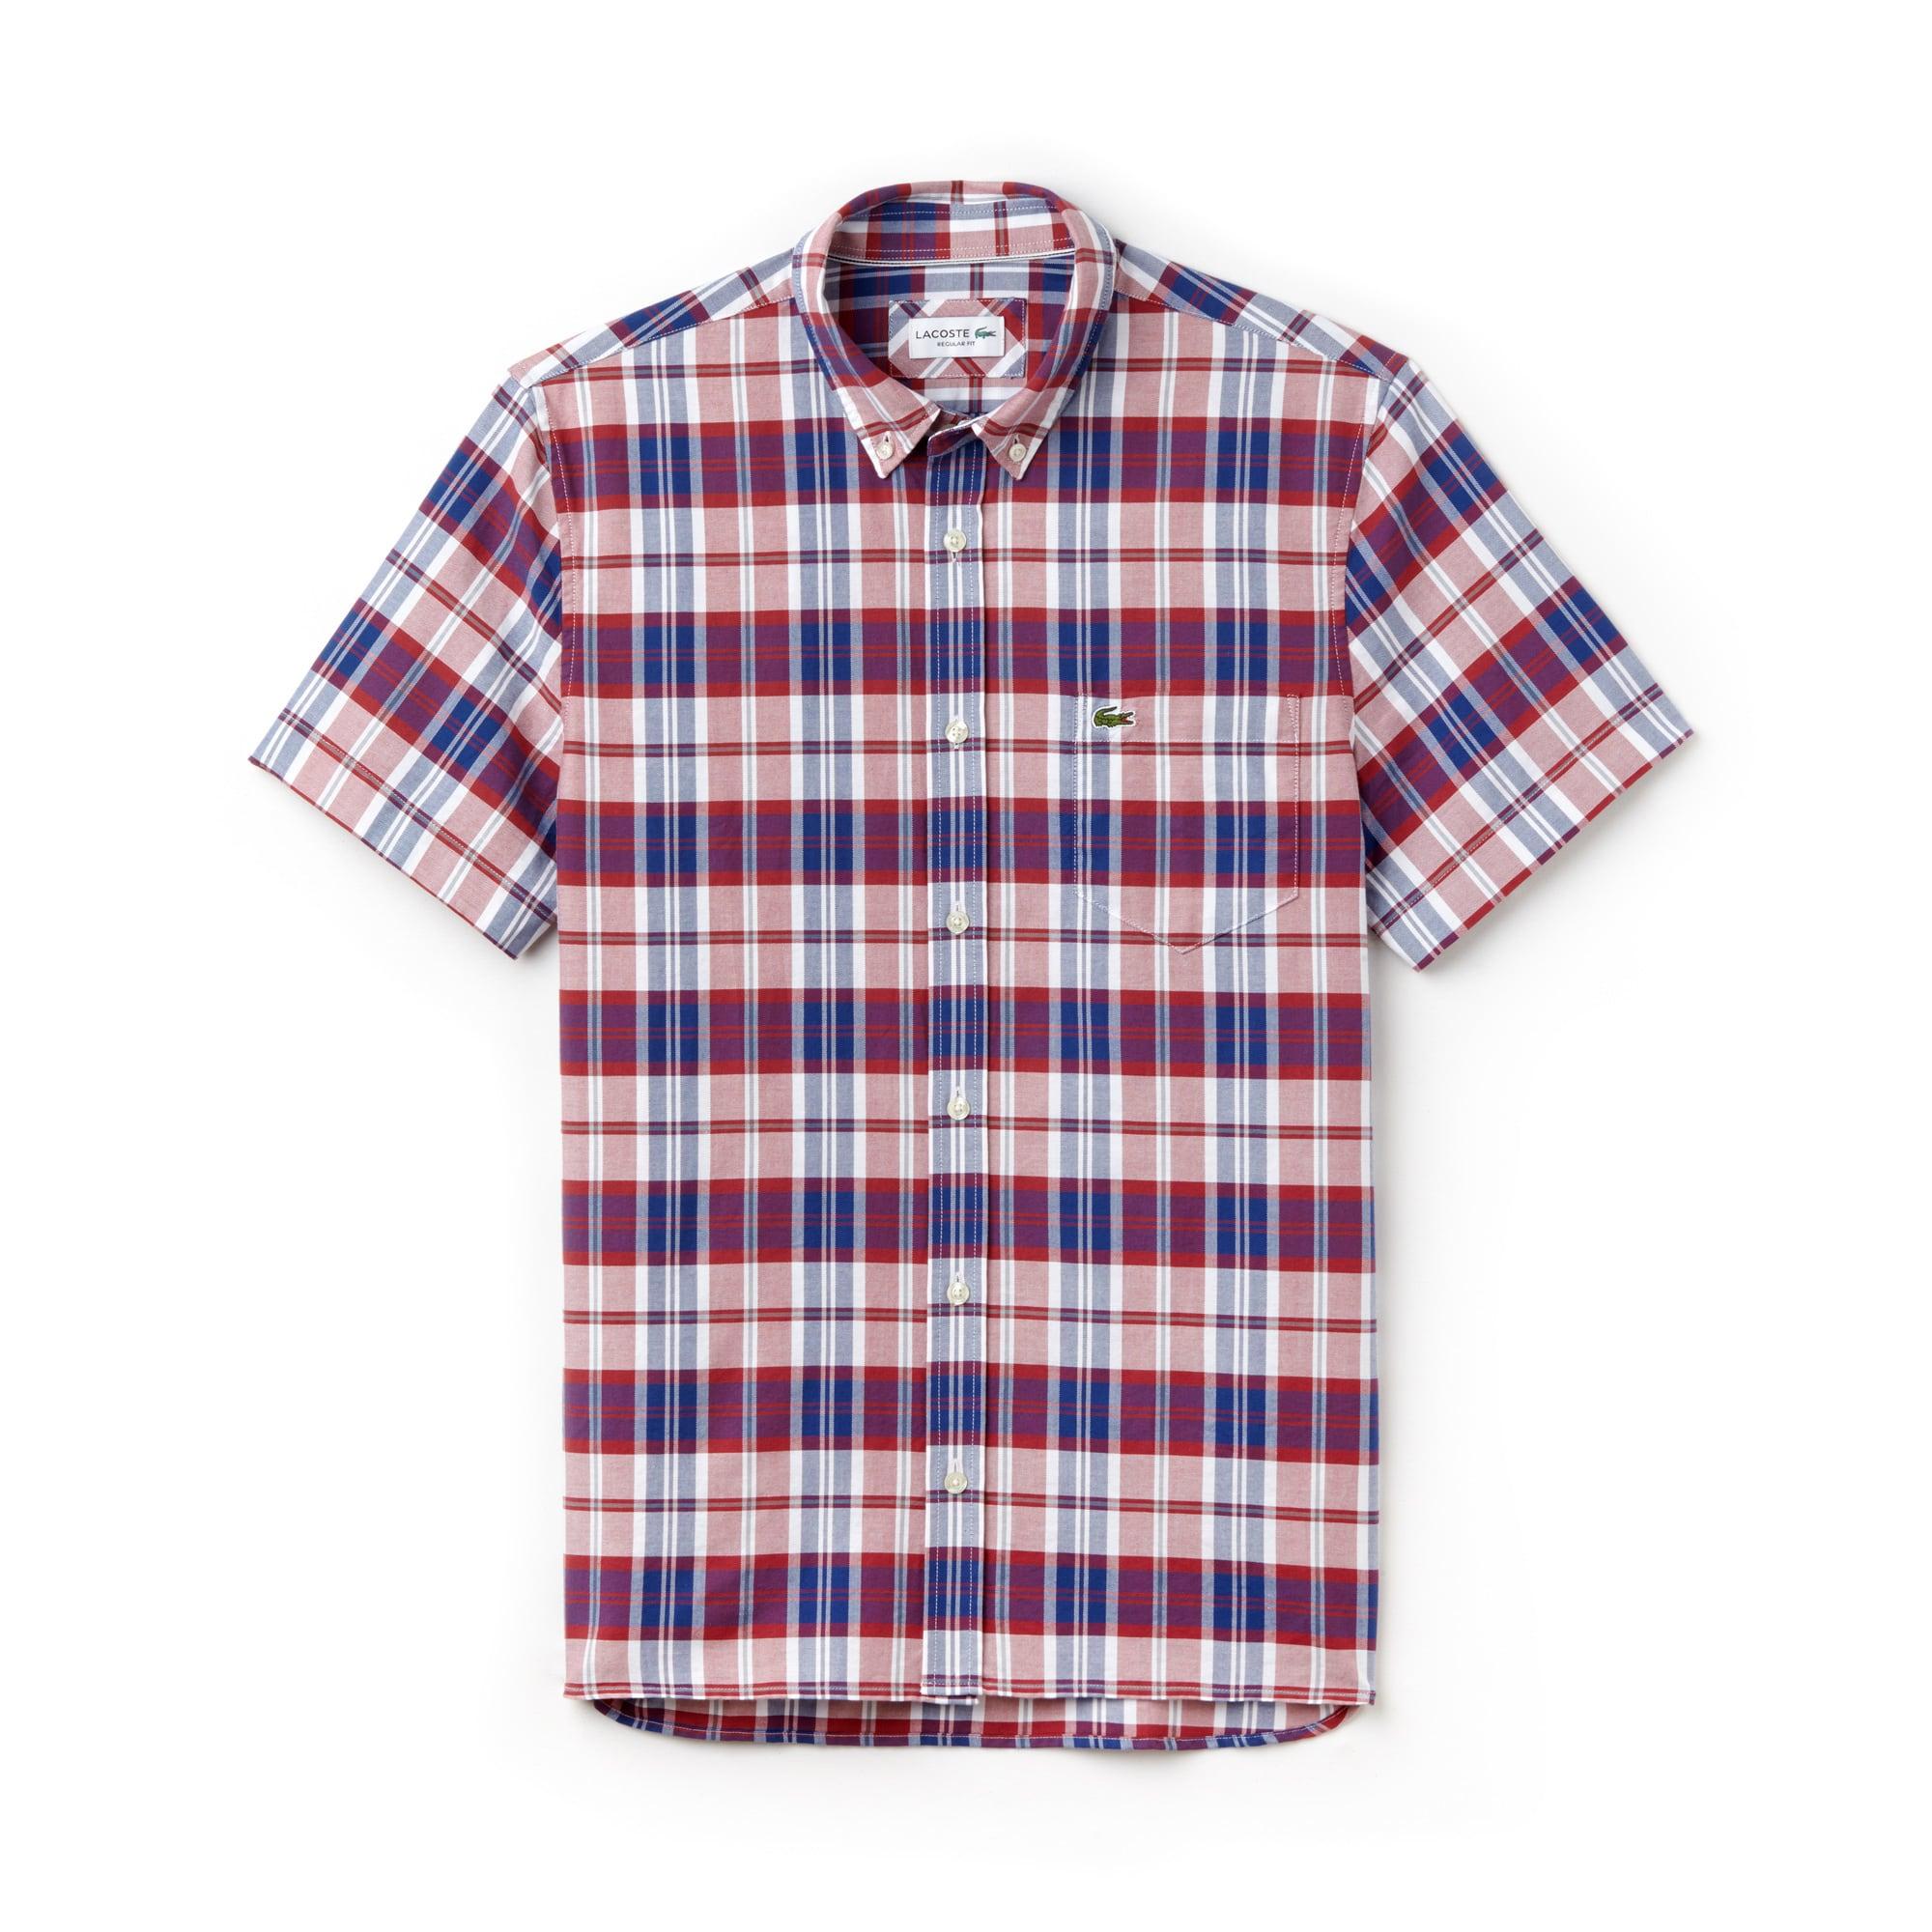 Men's Regular Fit Check Oxford Shirt